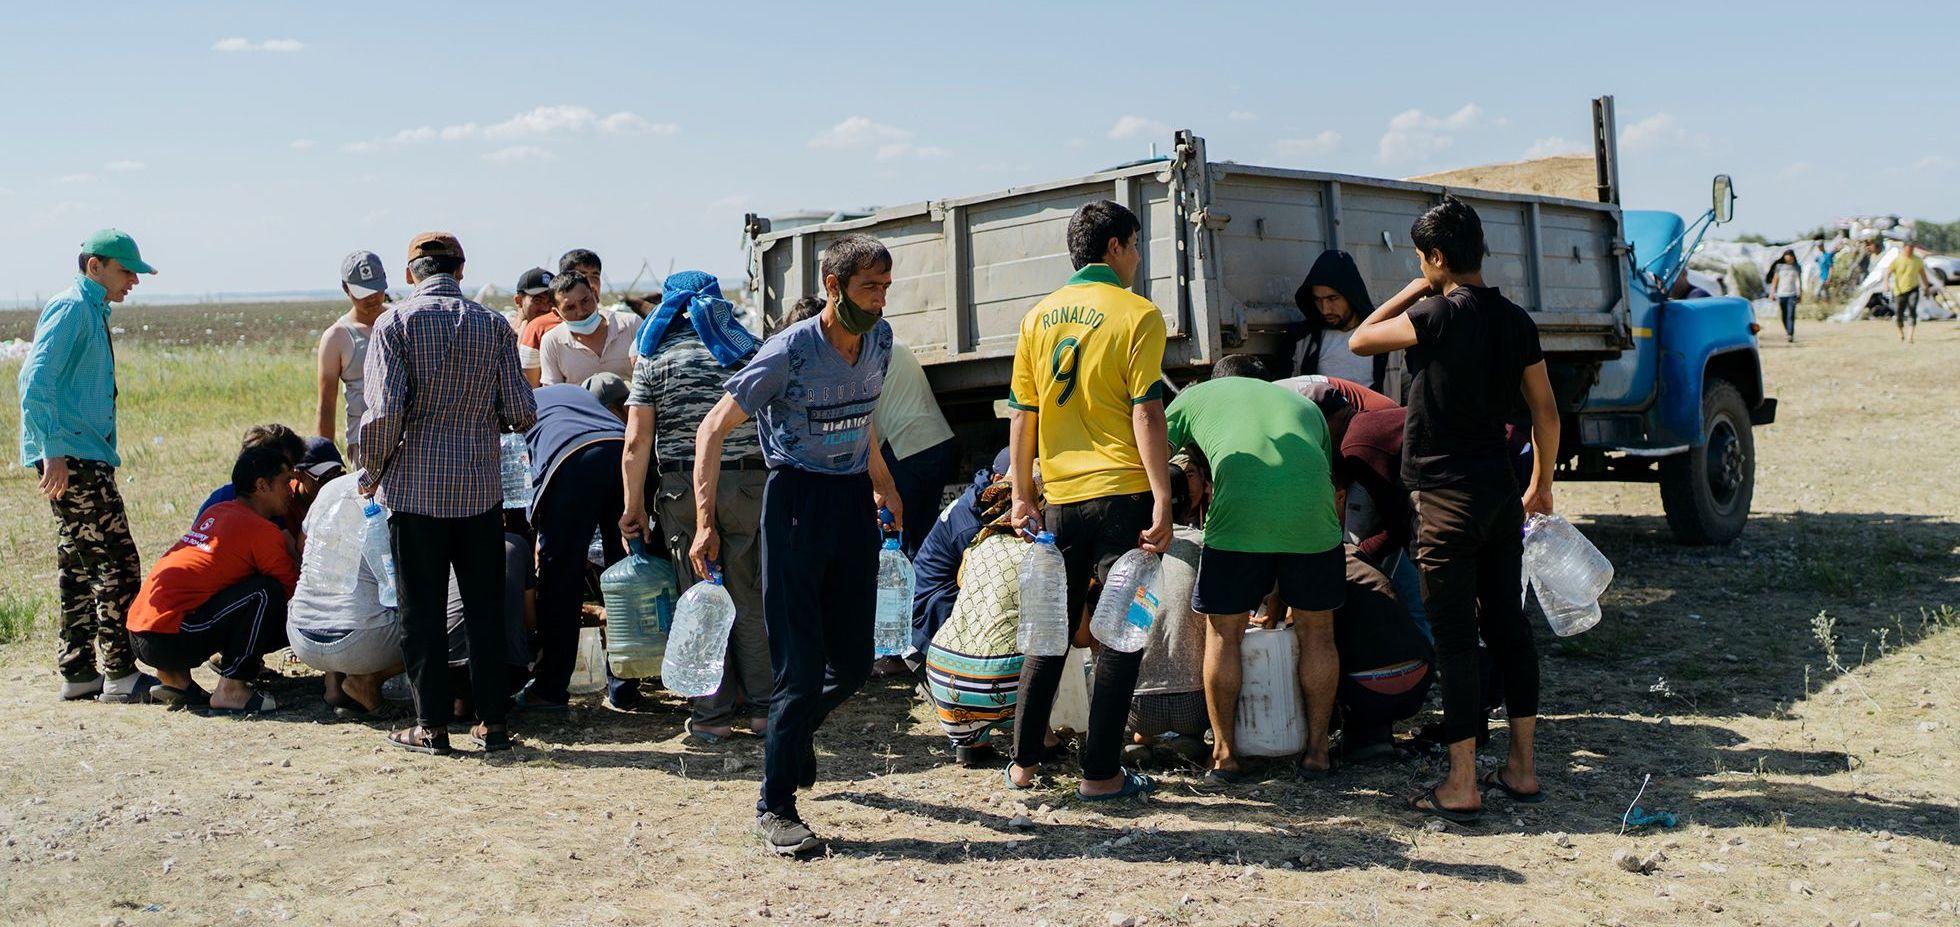 Uzbek migrants